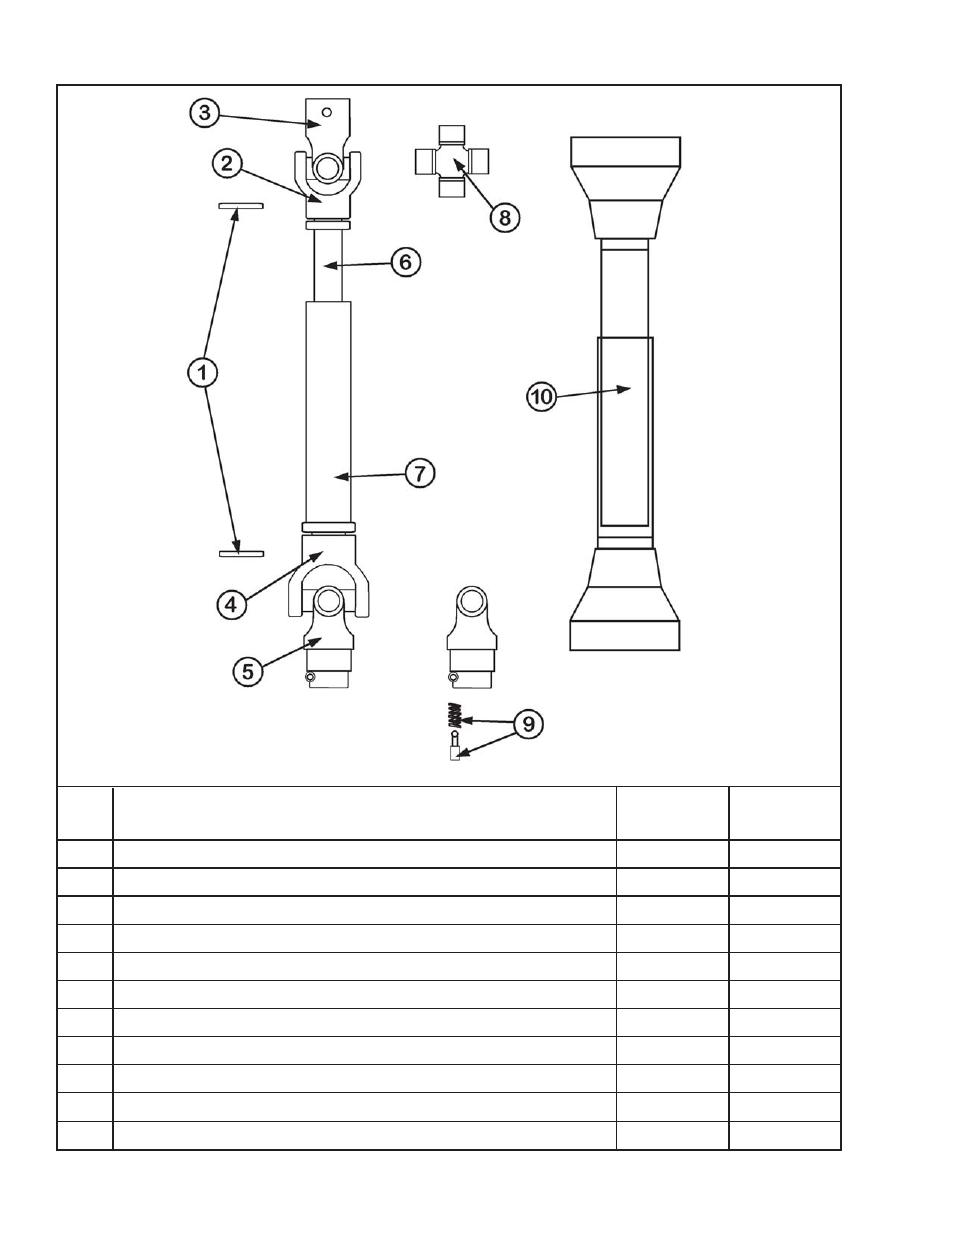 shear pin pto shaft king kutter xb user manual page 16 20 rh manualsdir com king kutter xb manual king kutter manual food processor